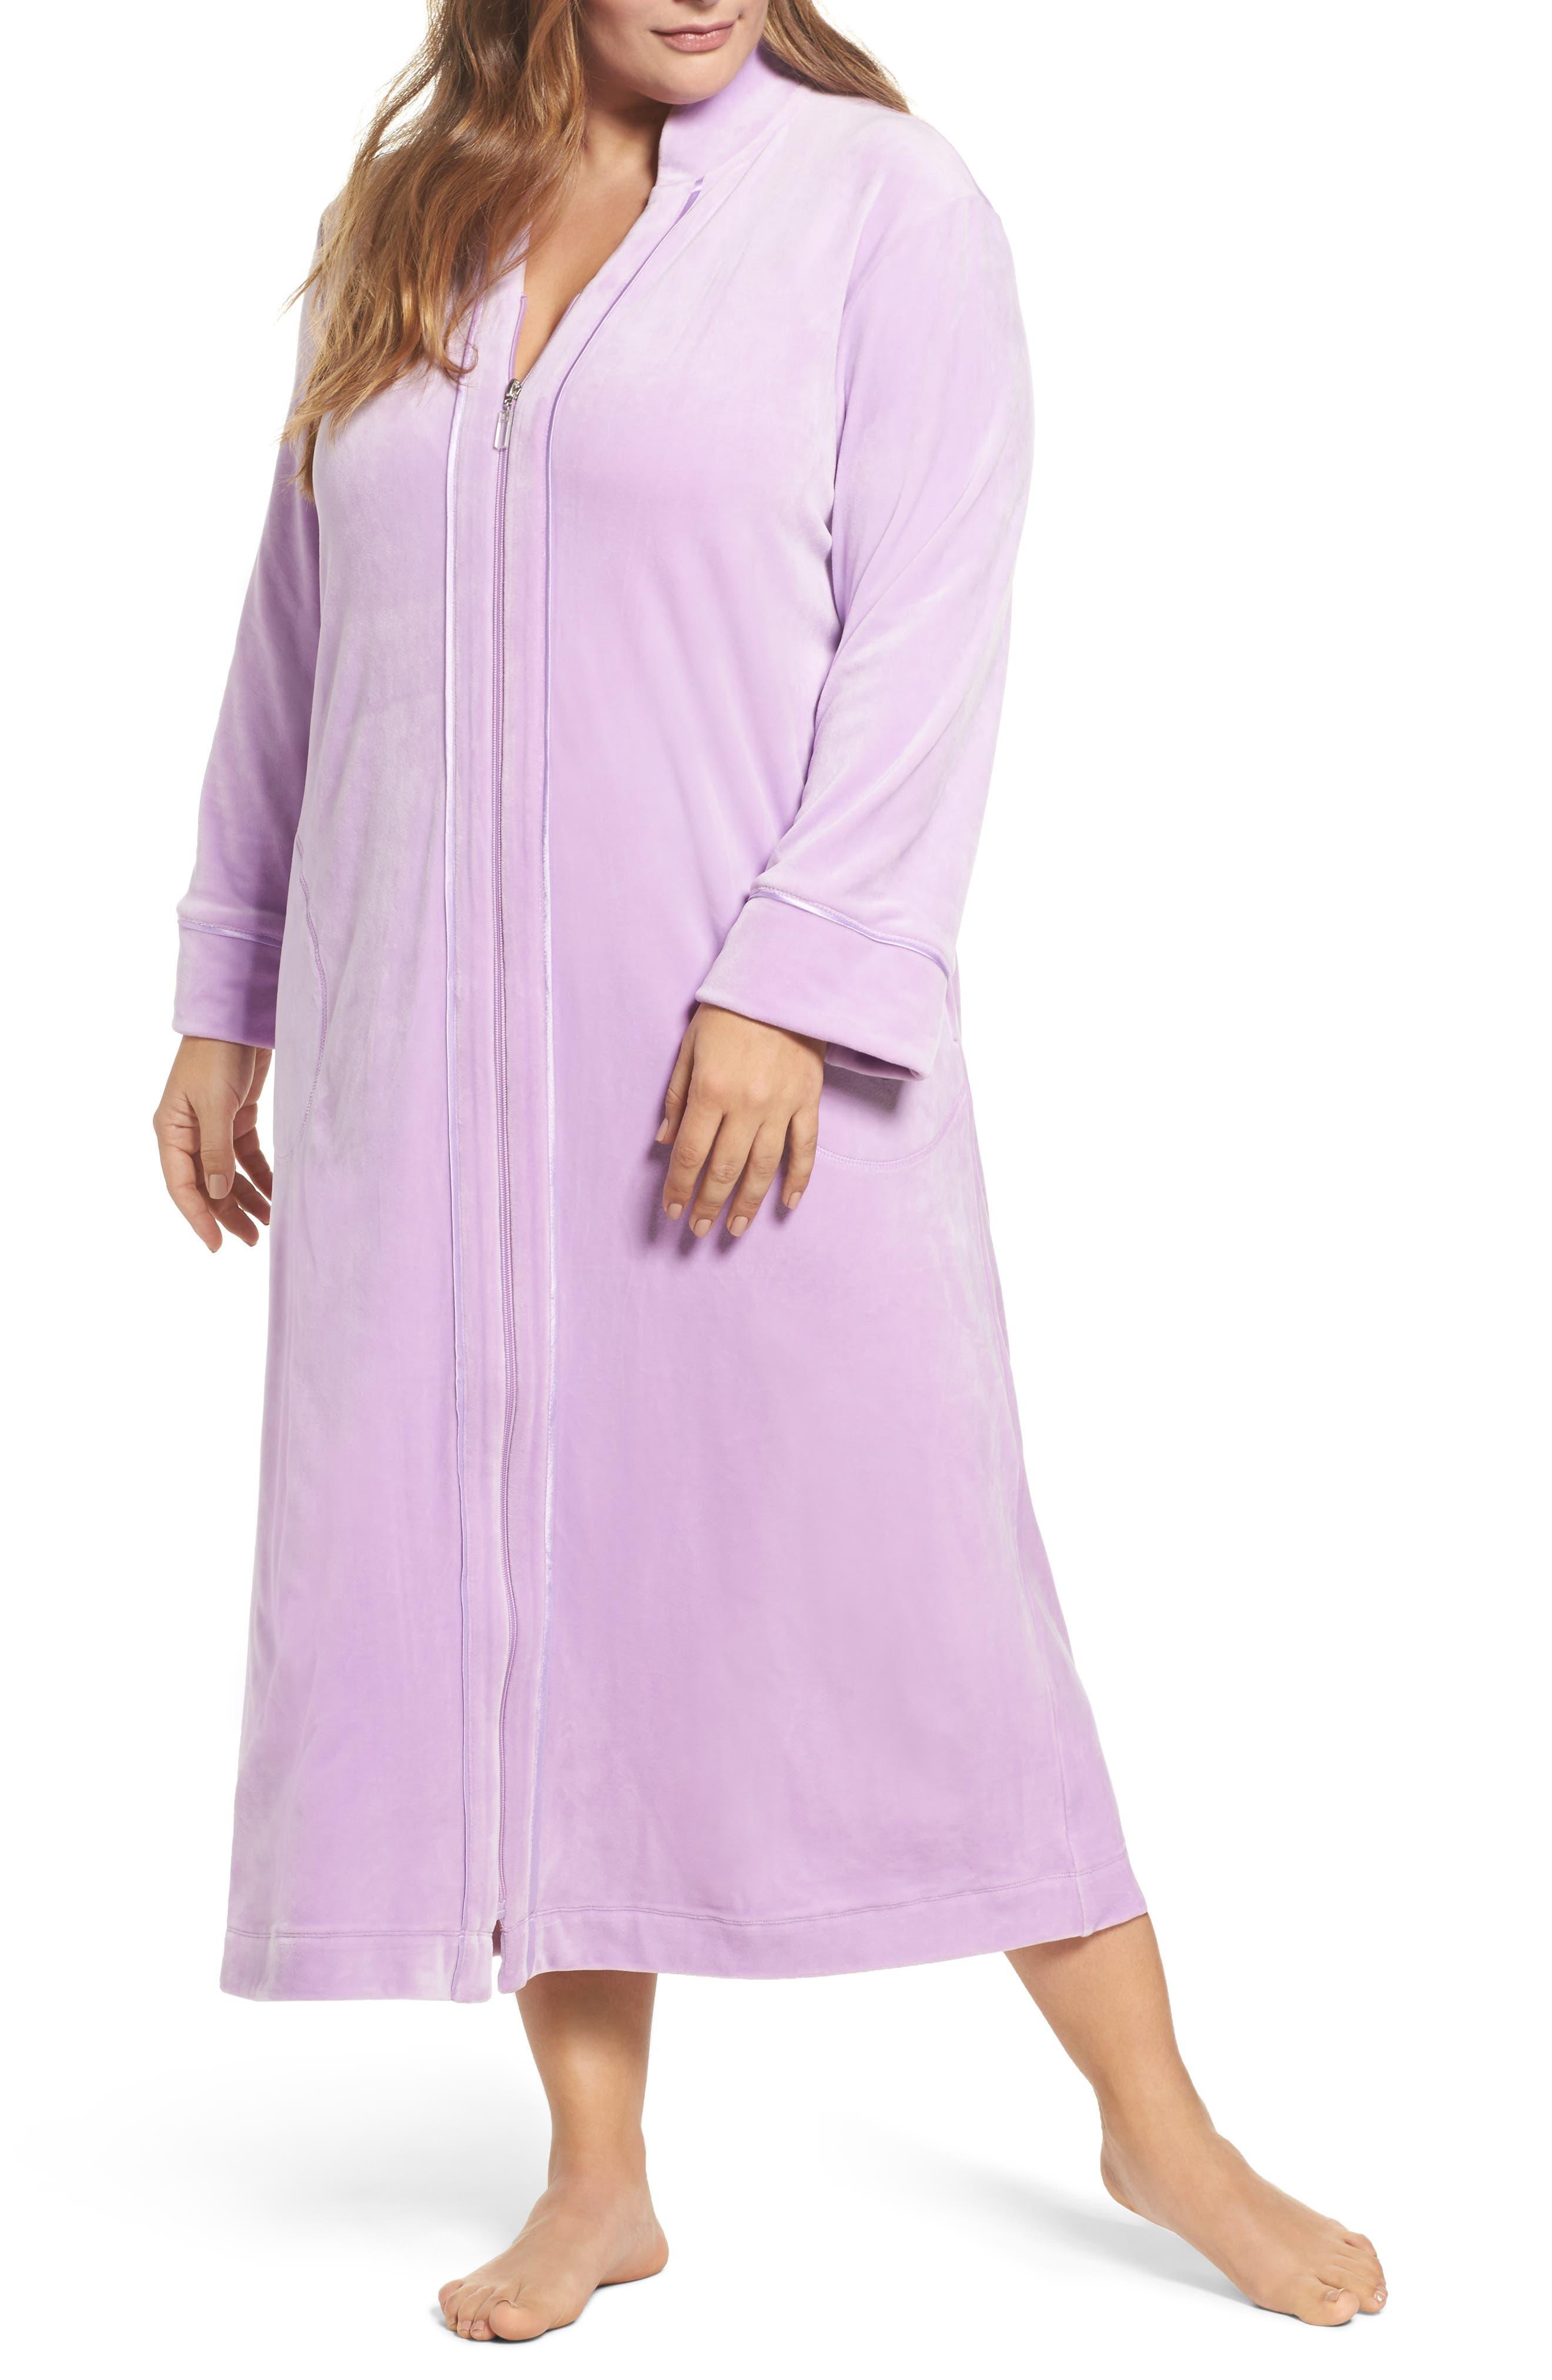 Carole Hochman Velour Zip Robe (Plus Size)